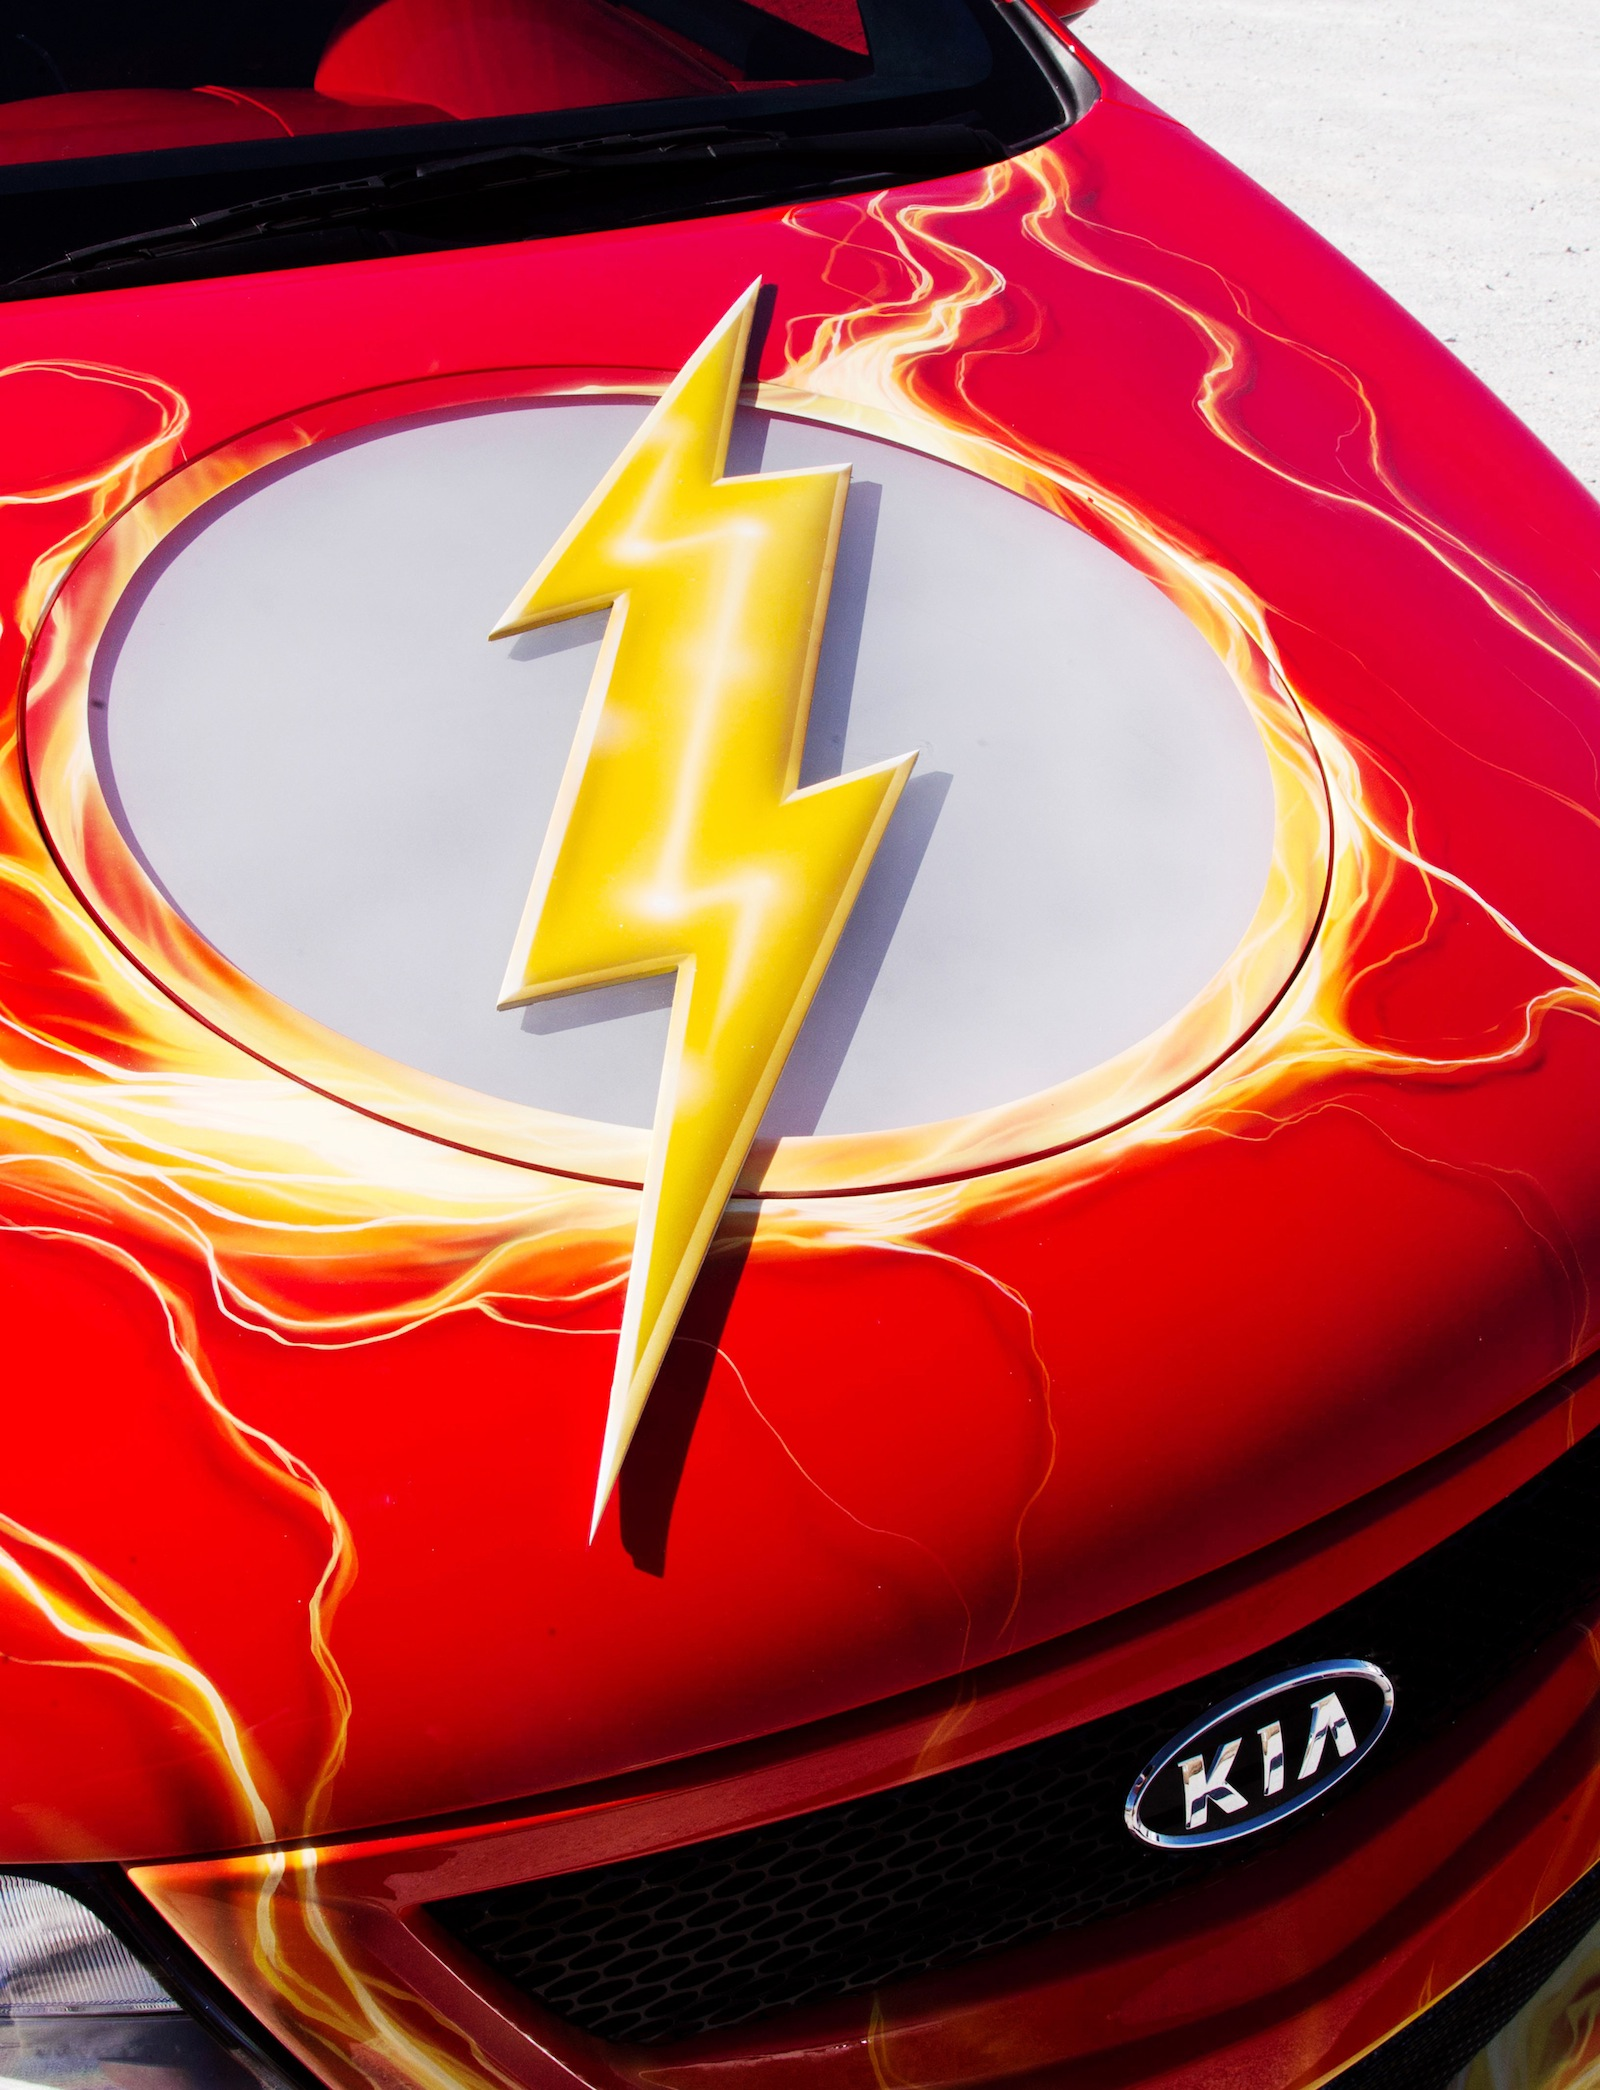 Super Auto Sales >> Kia Justice League super hero cars unveiled at 2012 SEMA ...